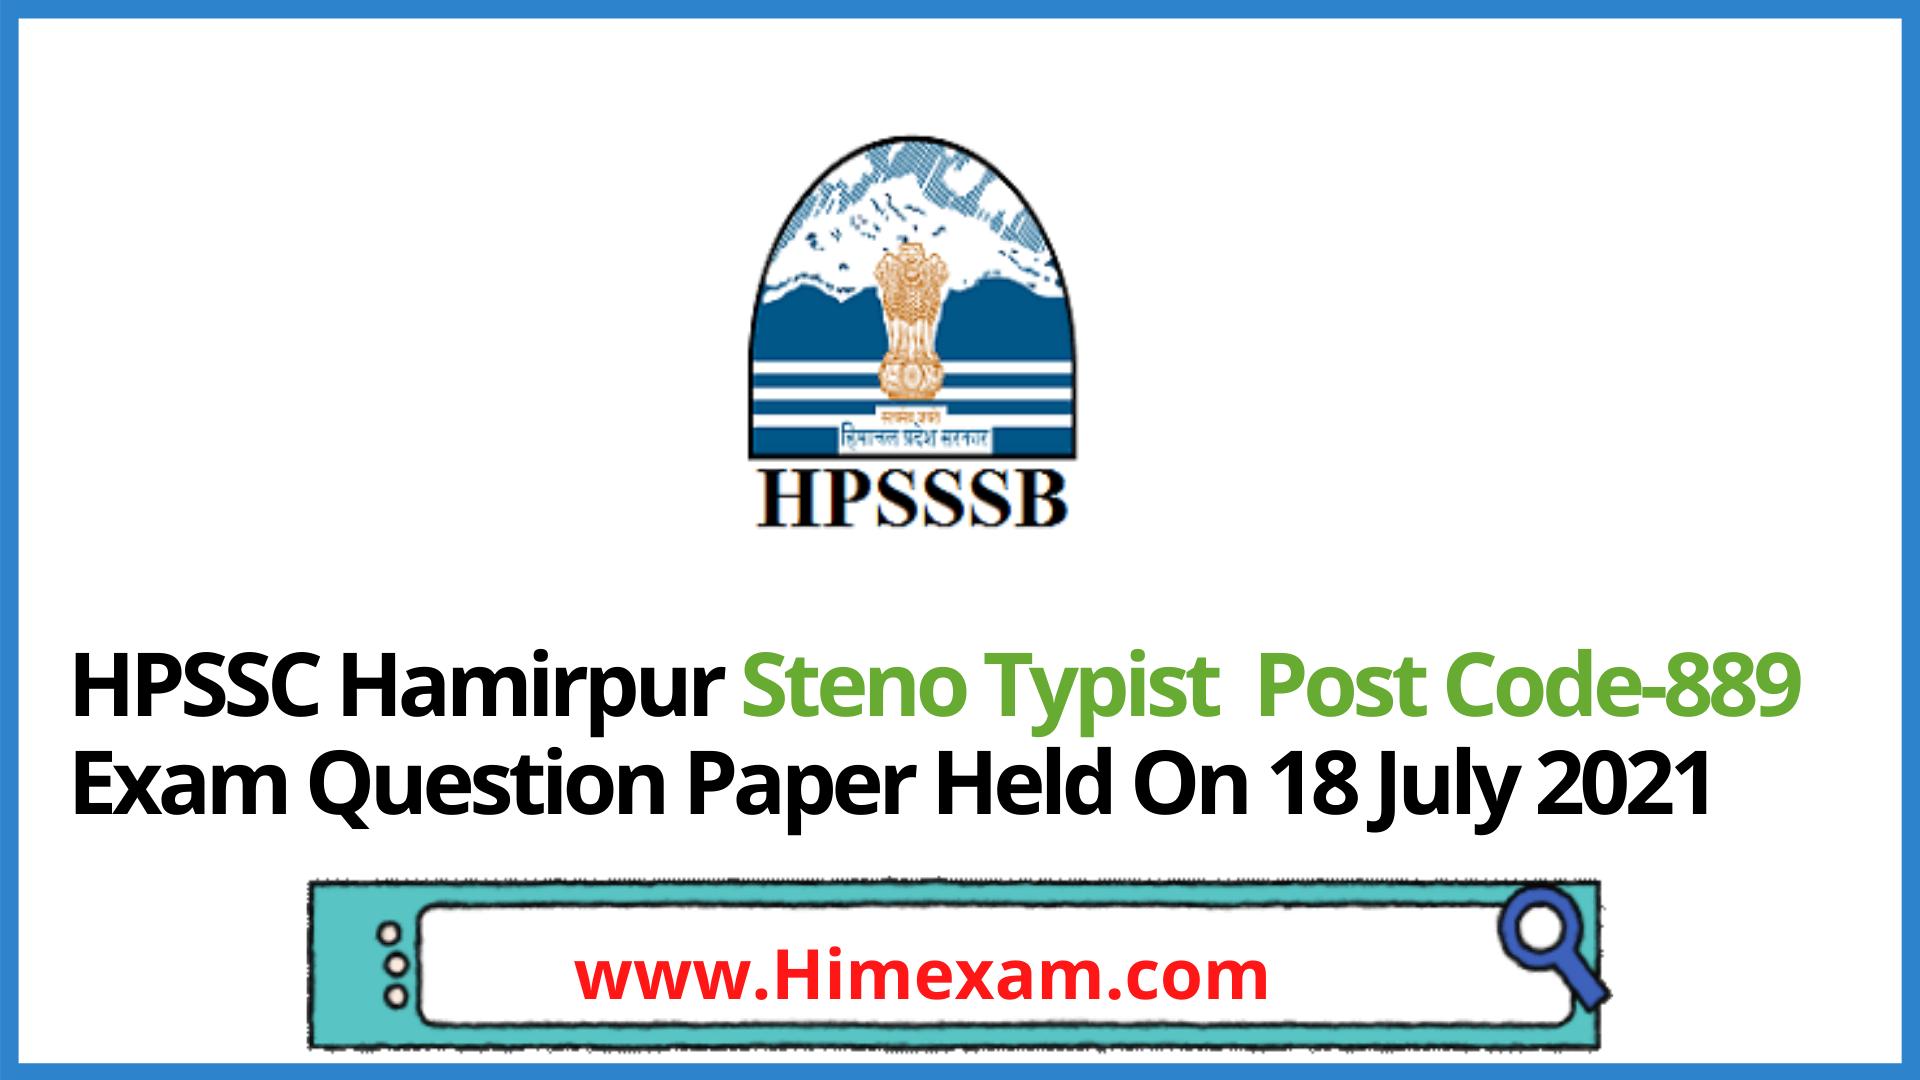 HPSSC Hamirpur Steno Typist  Post Code-889 Exam Question Paper Held On 18 July 2021